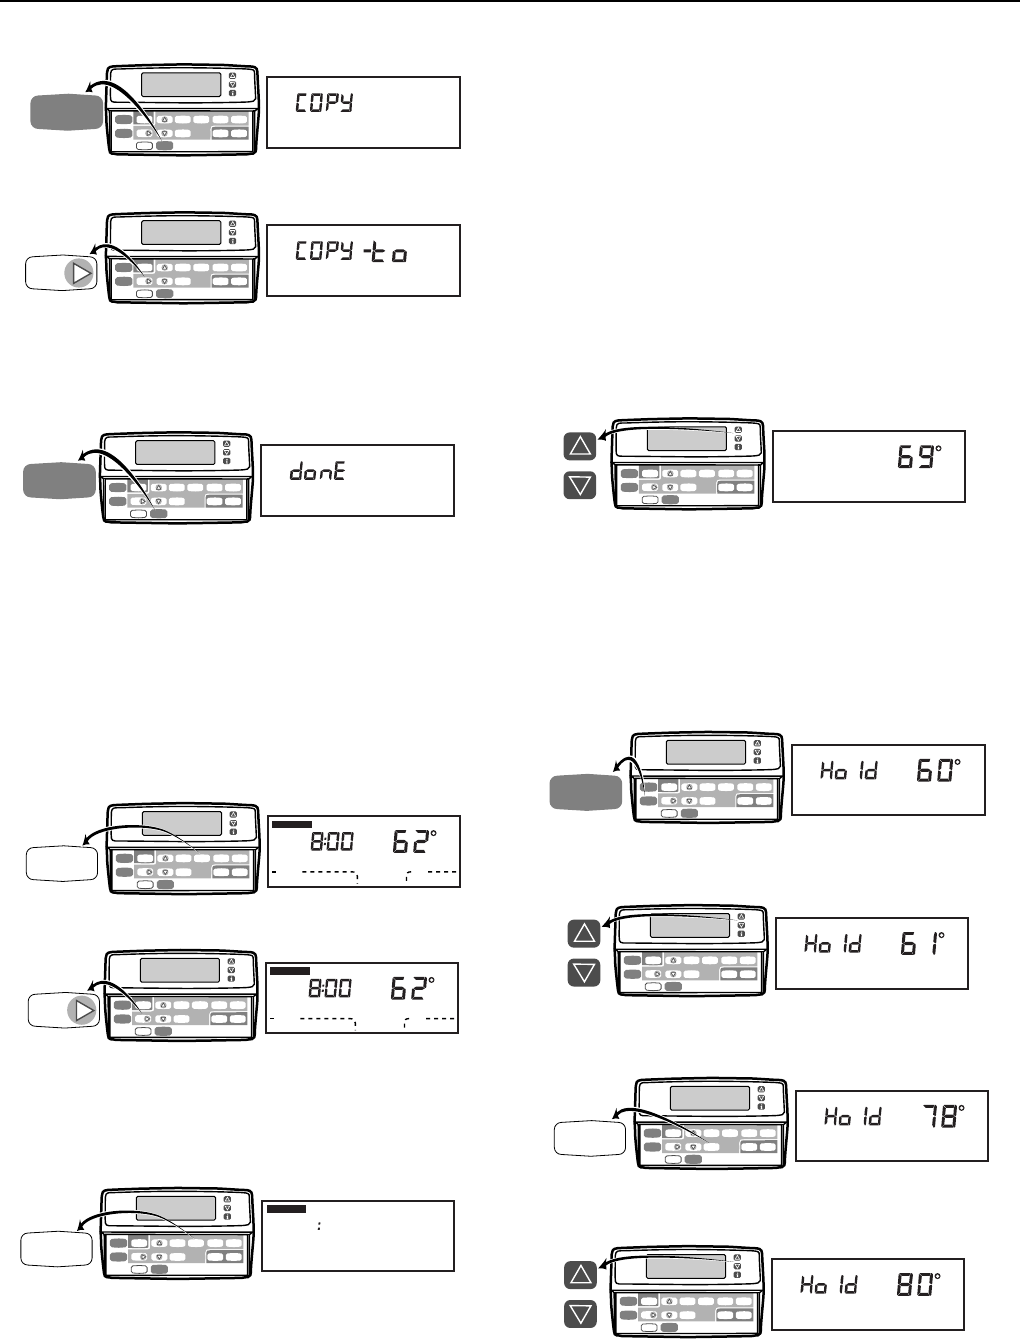 Honeywell Chronotherm Iv Plus Wiring Diagram